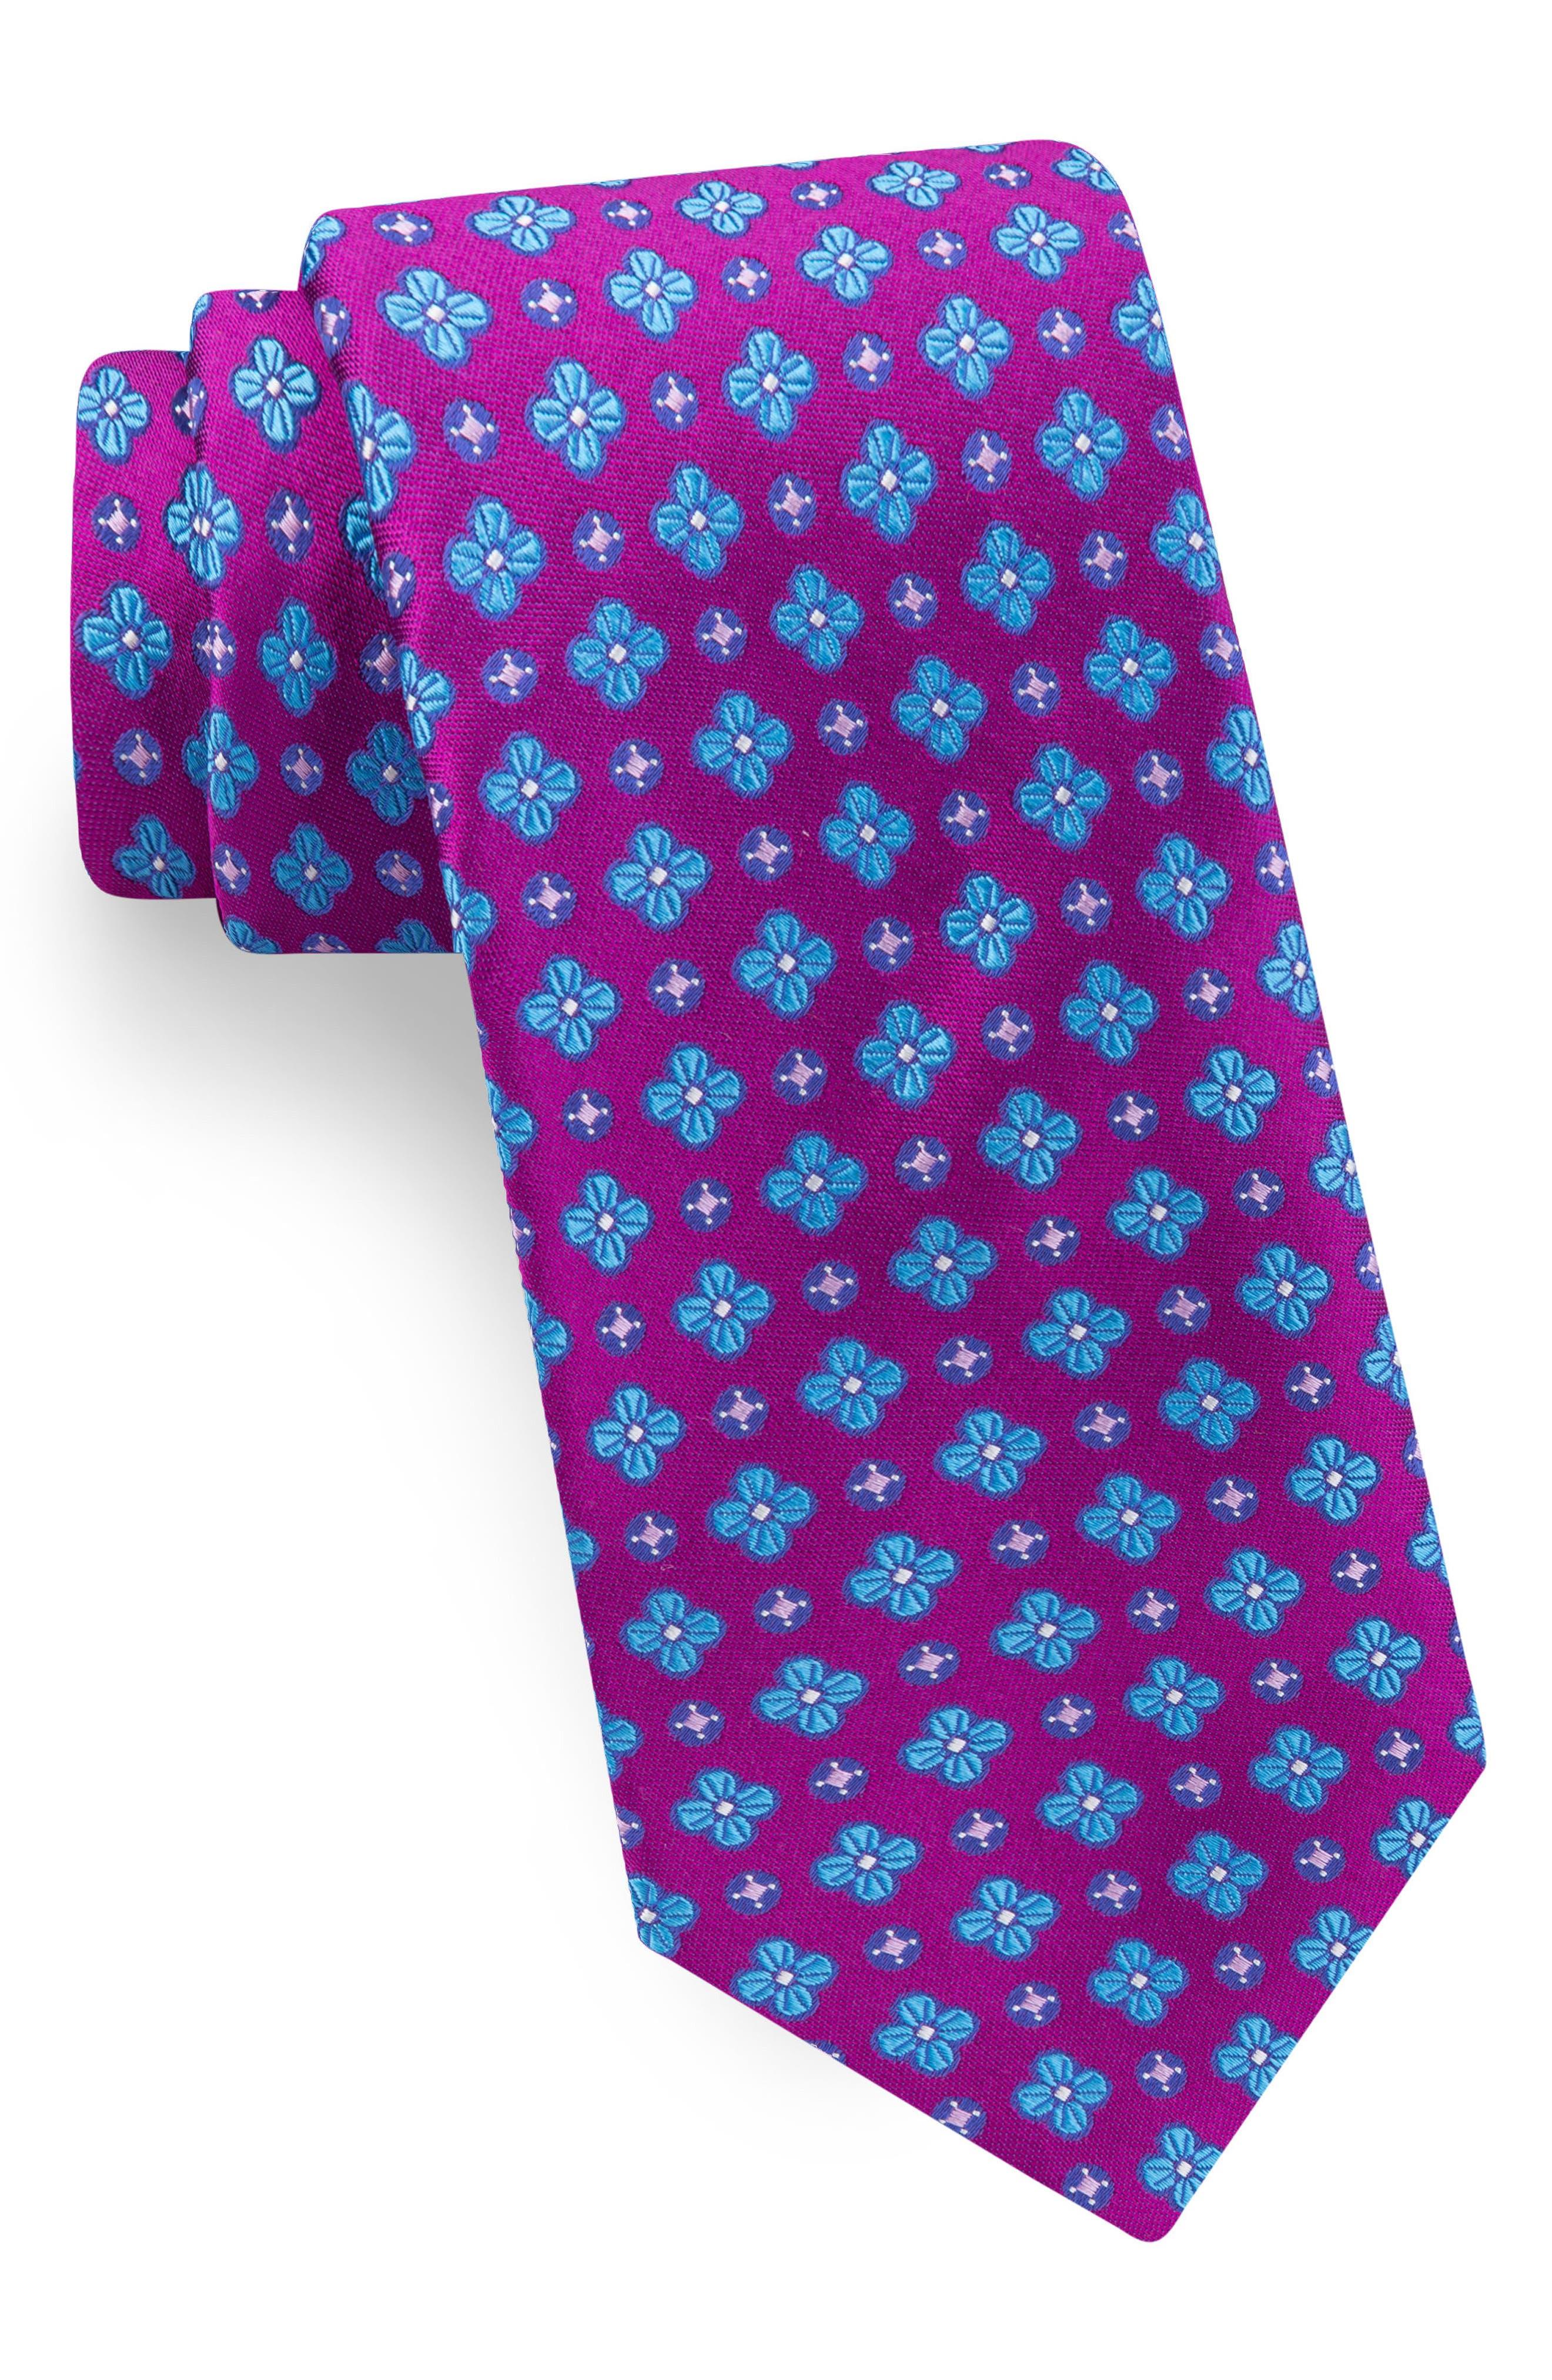 Lansbury Floral Silk Tie,                             Main thumbnail 1, color,                             Fuchsia